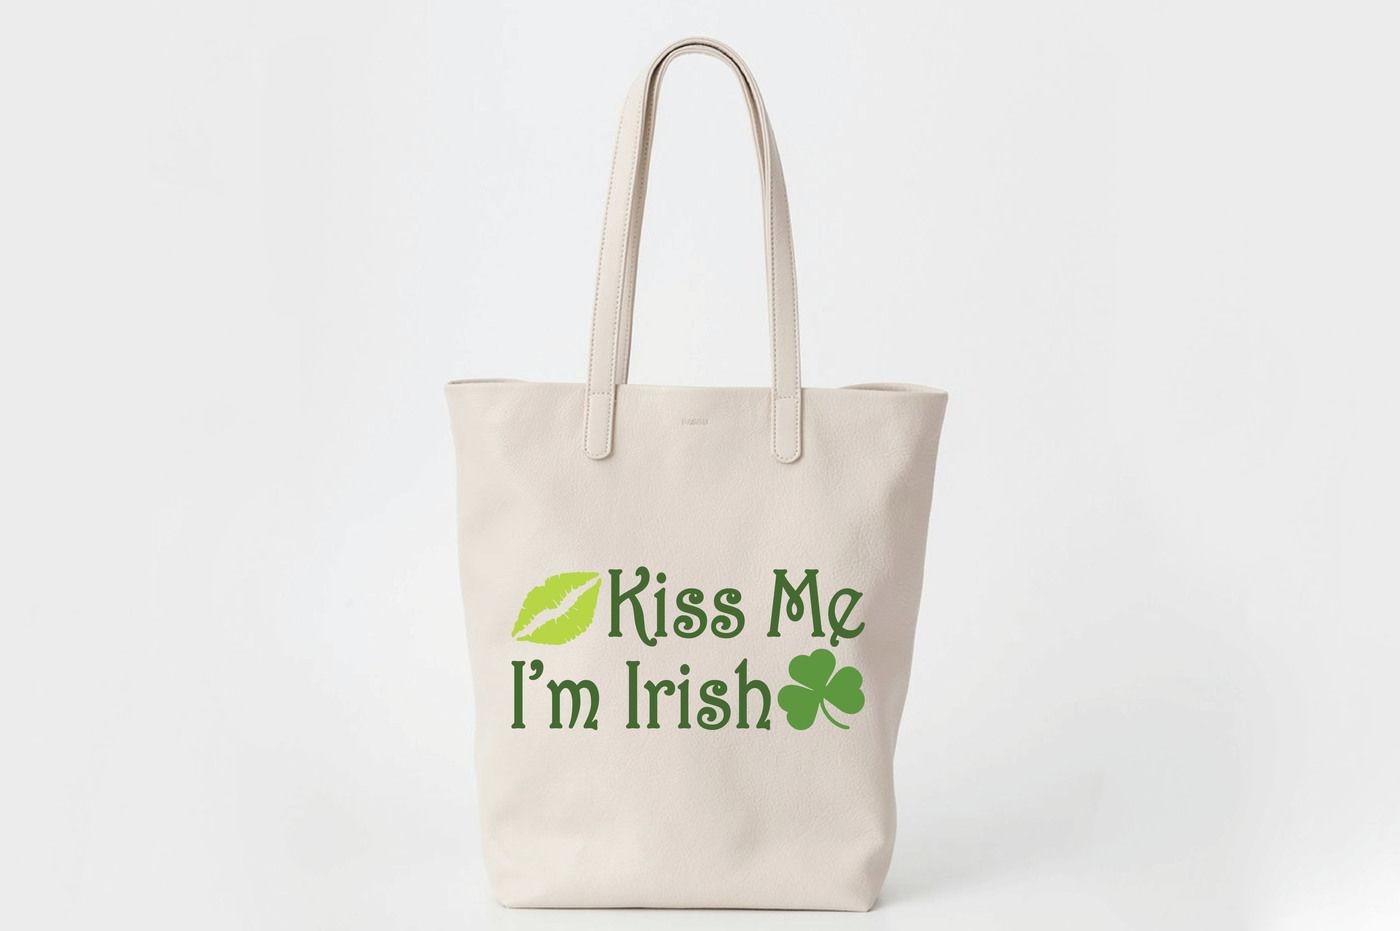 Kiss Me I M Irish St Patrick S Day Svg Cut File Dxf Png Eps By Shannon Keyser Thehungryjpeg Com